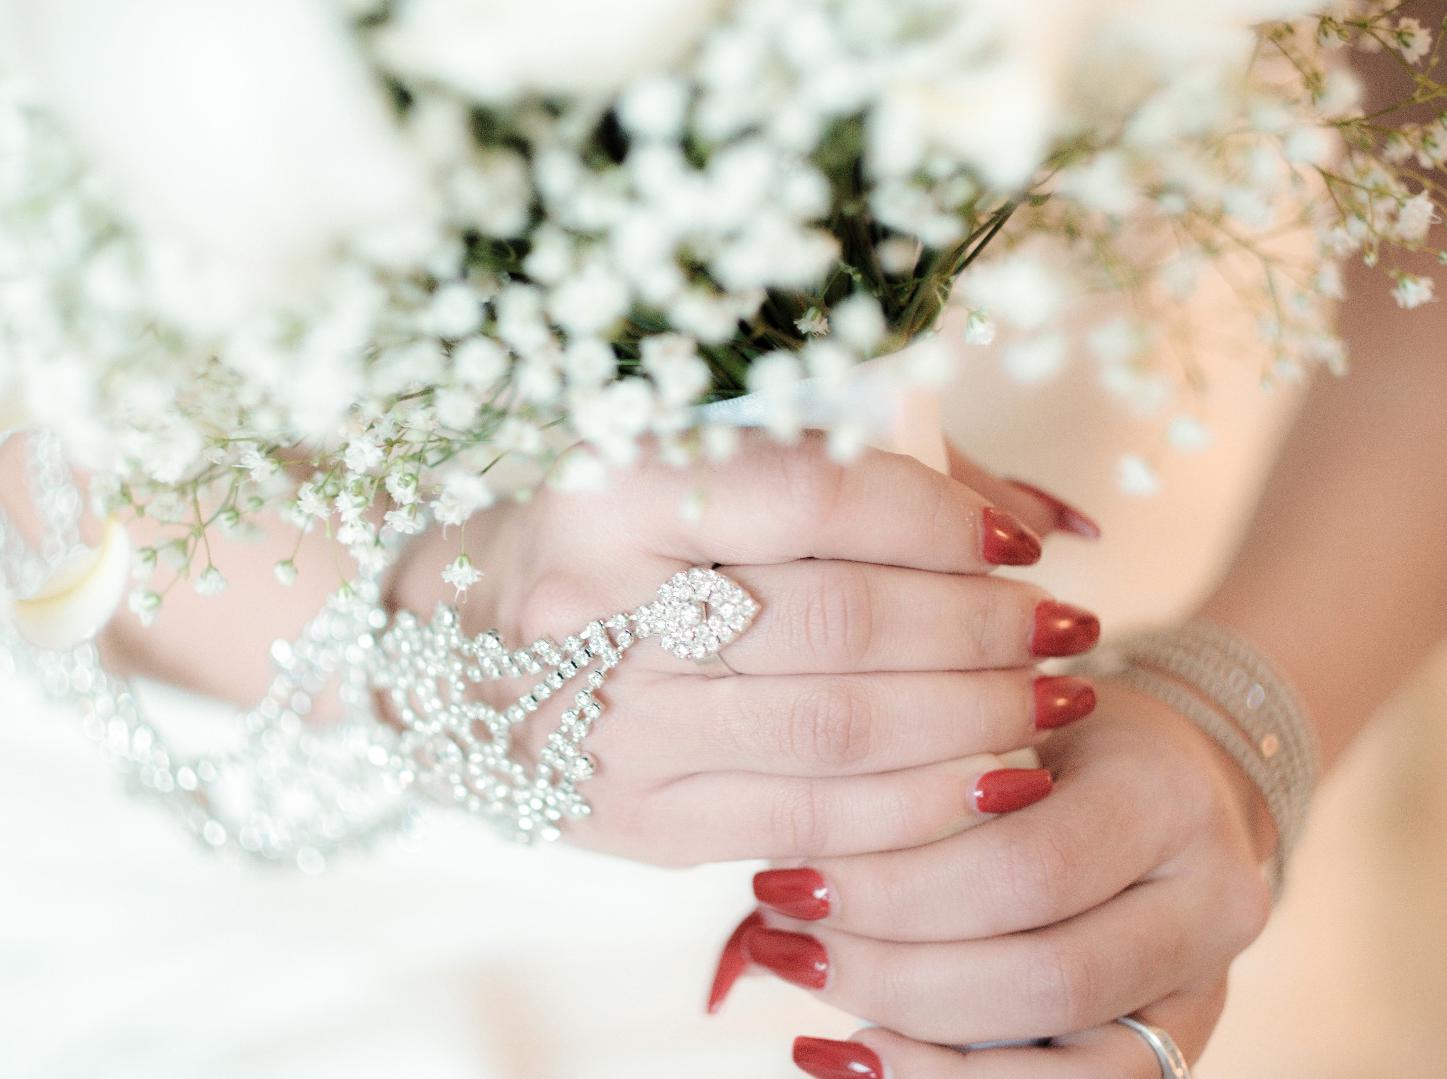 bodas-sin-clasificar-sin-tema-cuba-25512.jpg